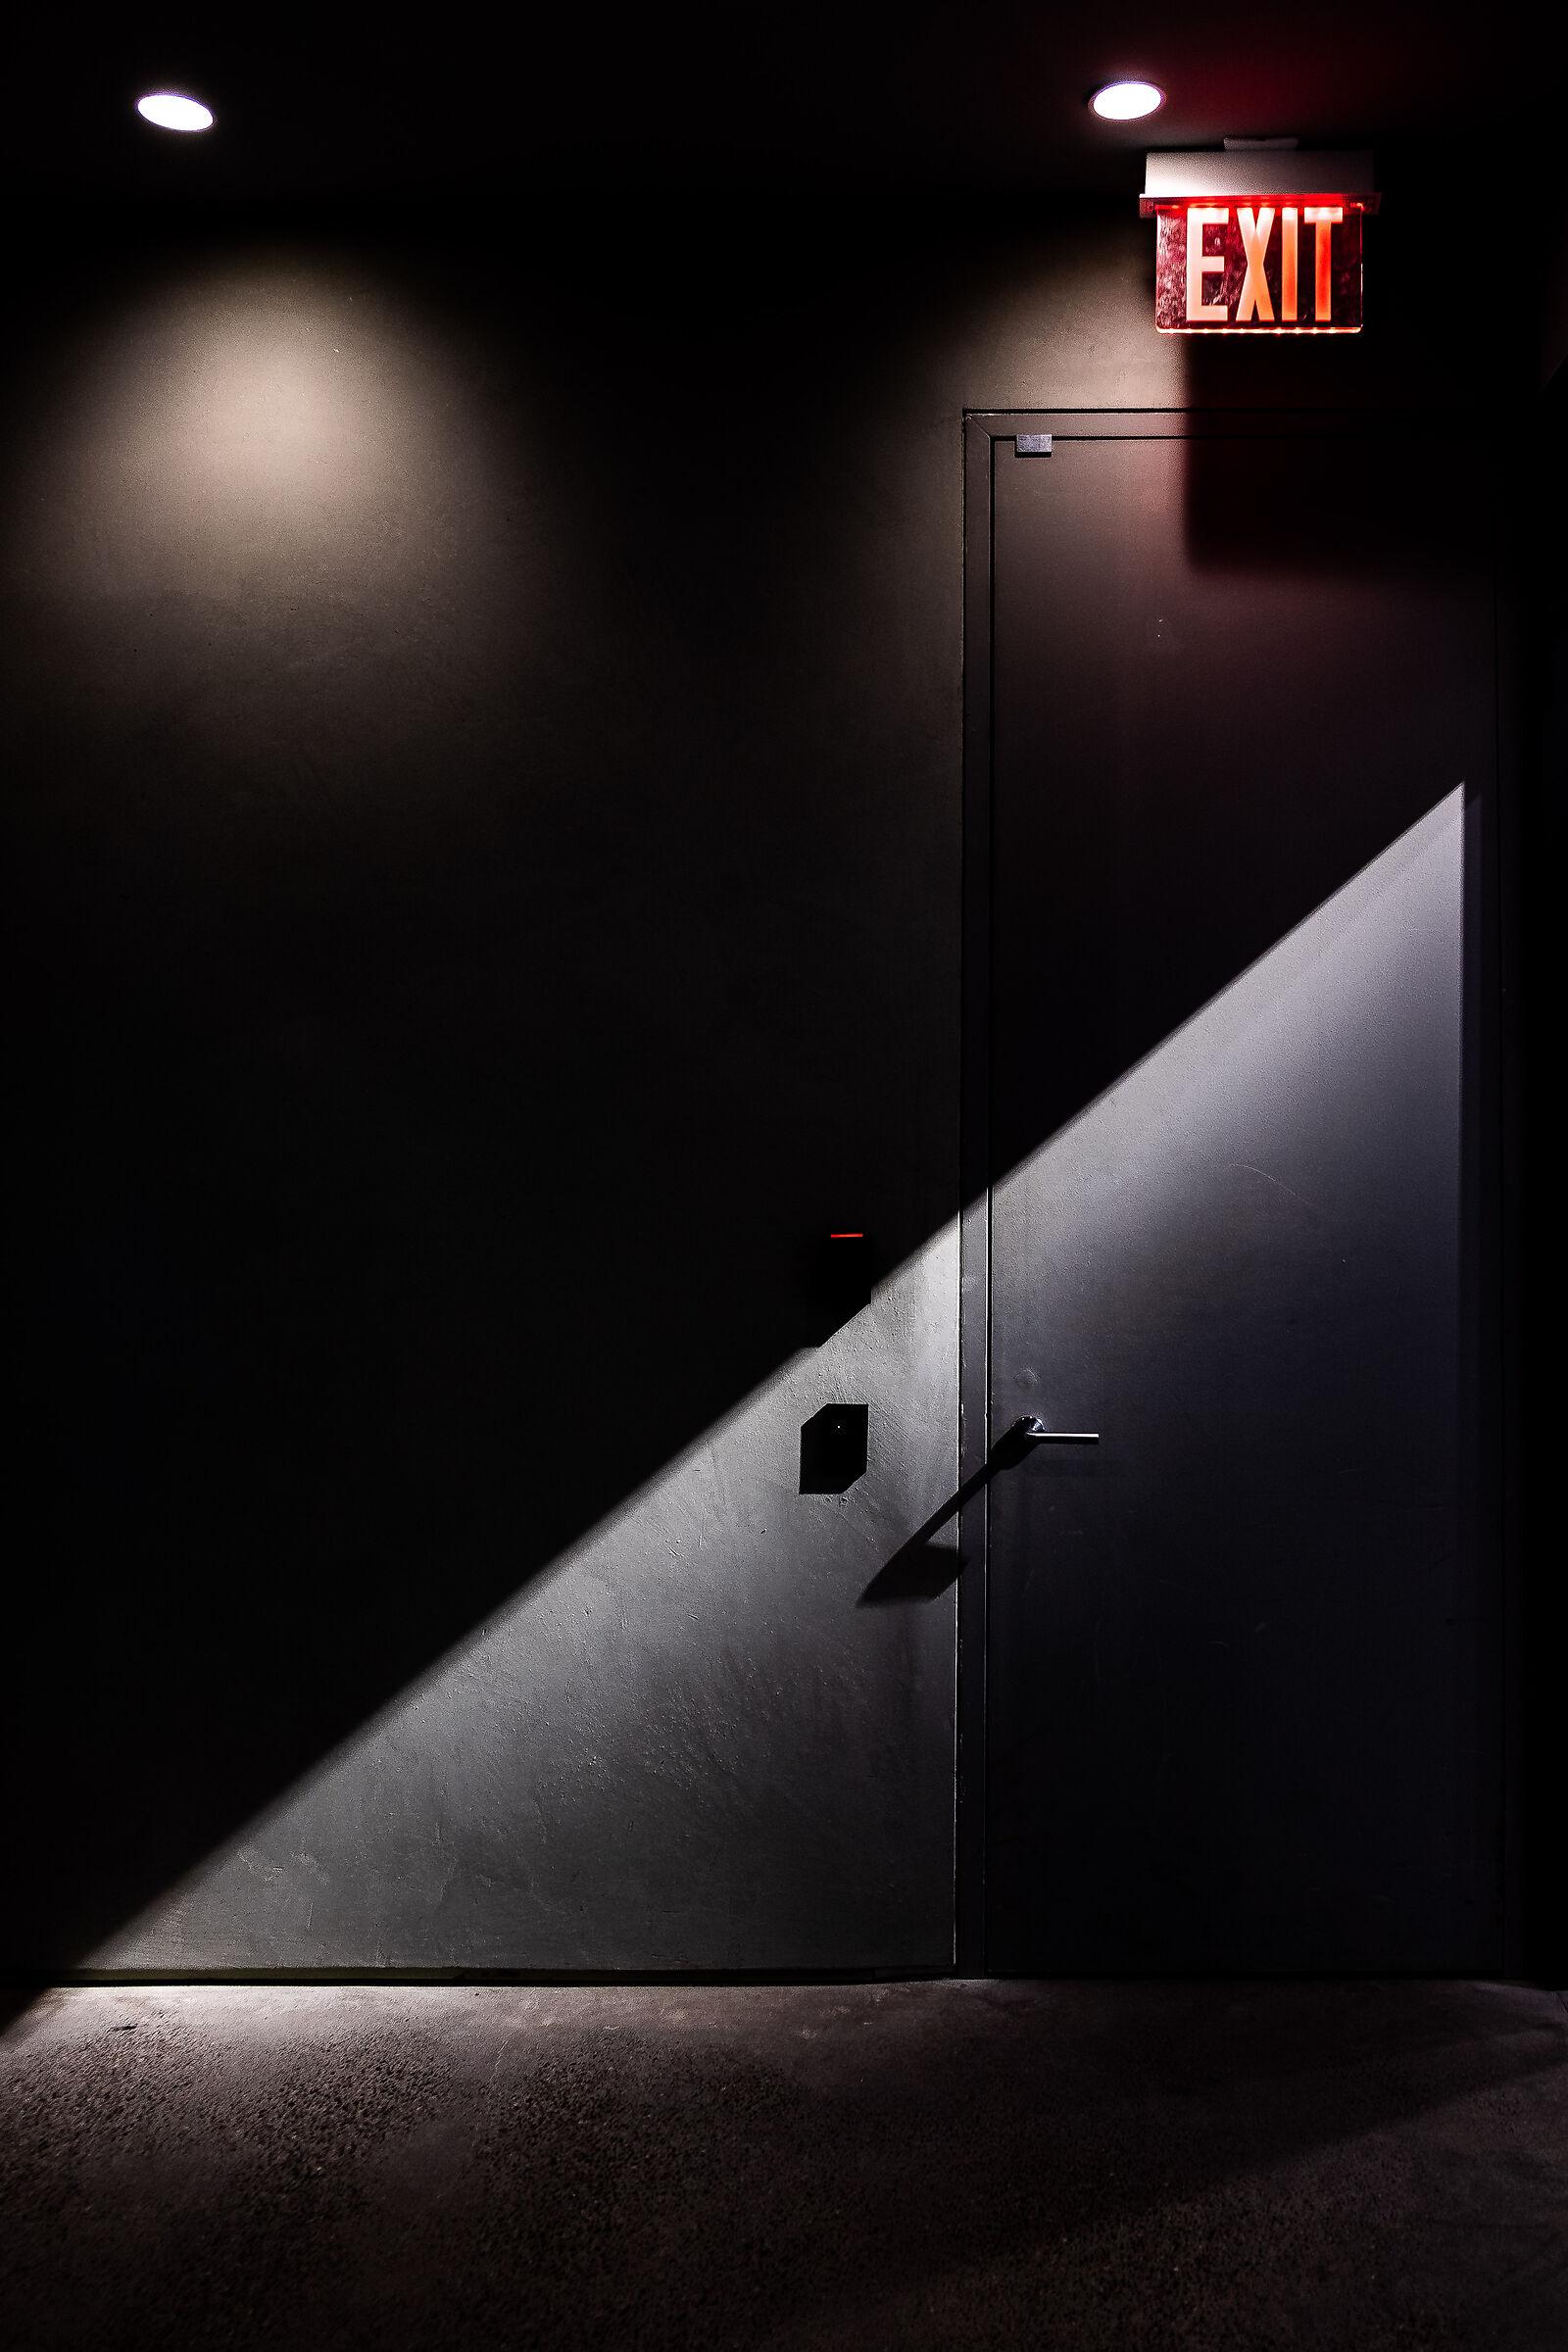 exit...